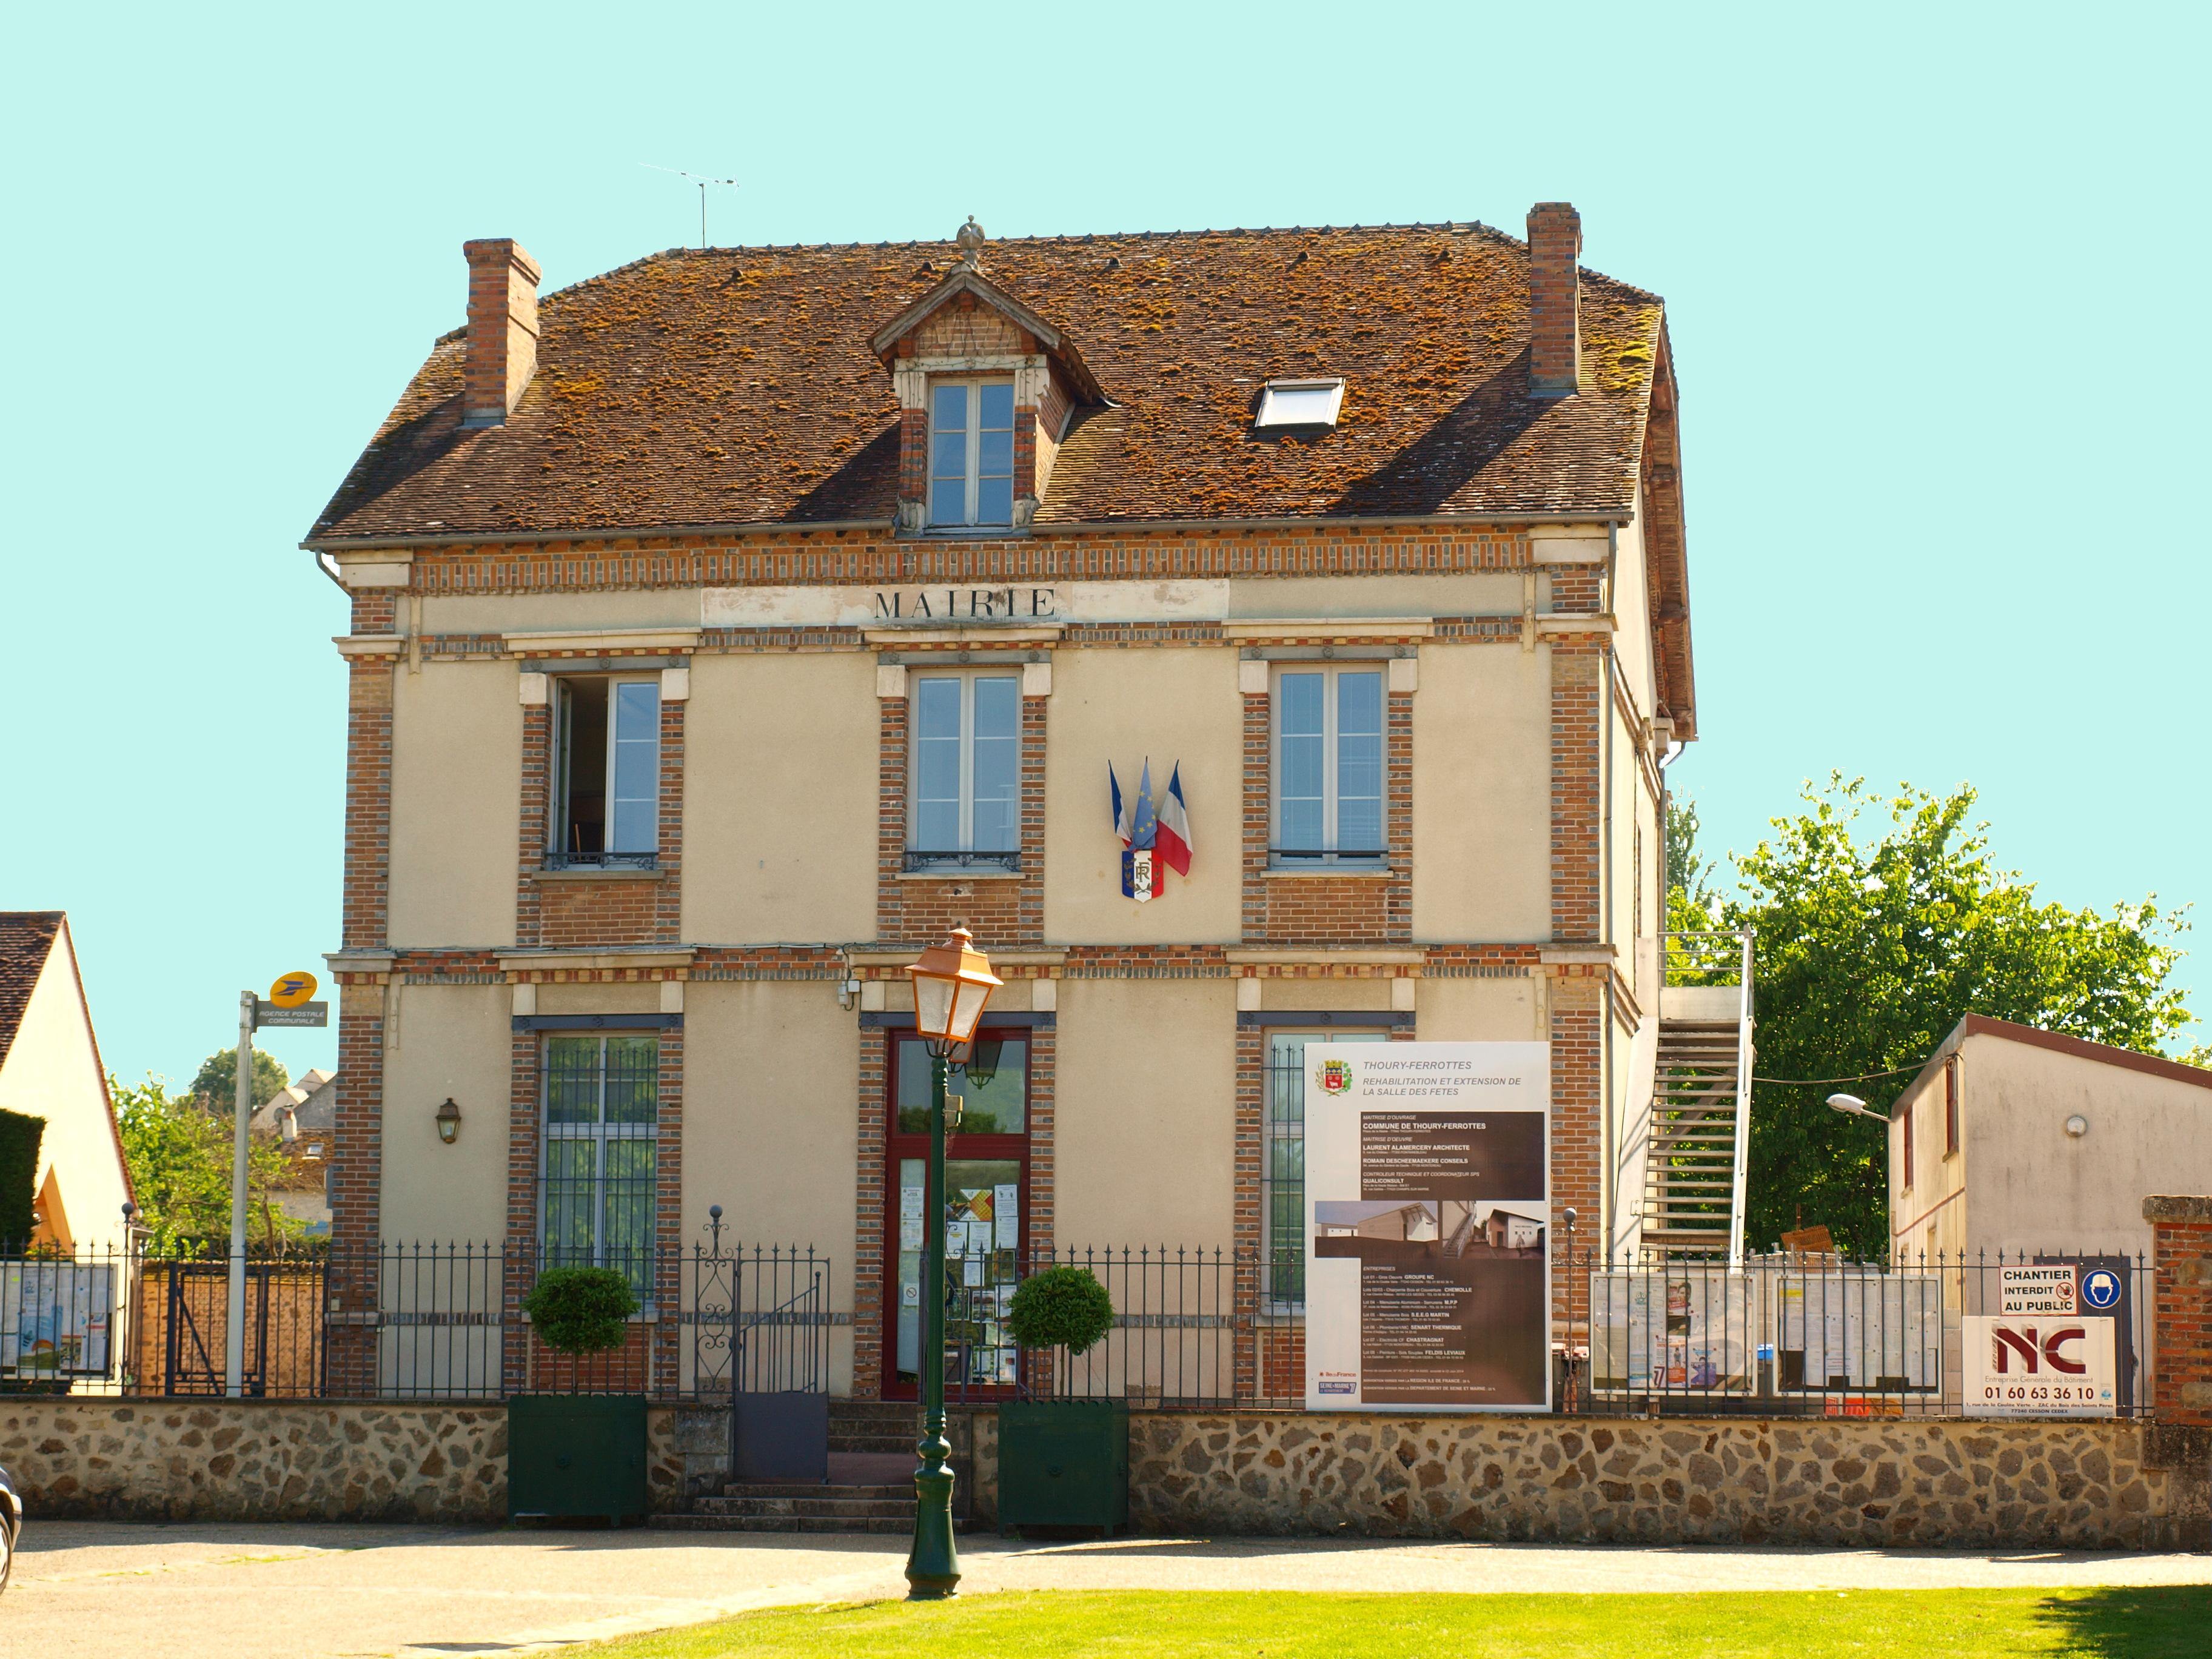 Entreprise Generale De Batiment 77 file:thoury-ferrottes-fr-77-mairie-01modif - wikimedia